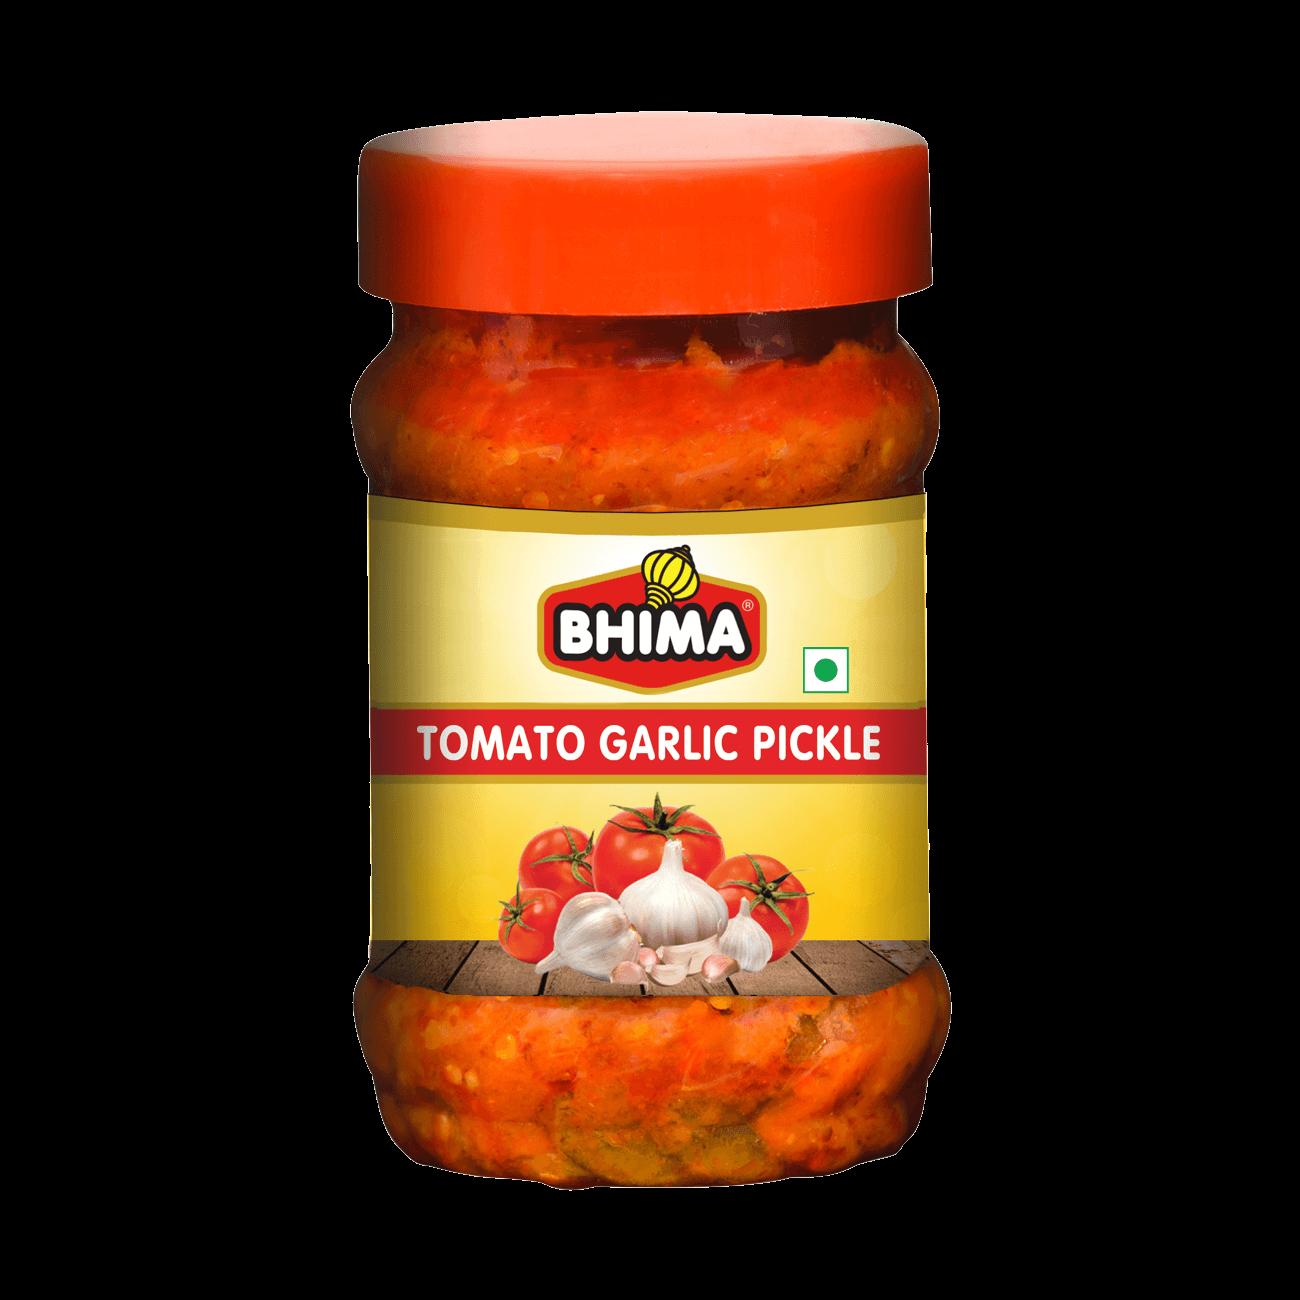 Bhima – Tomato Garlic